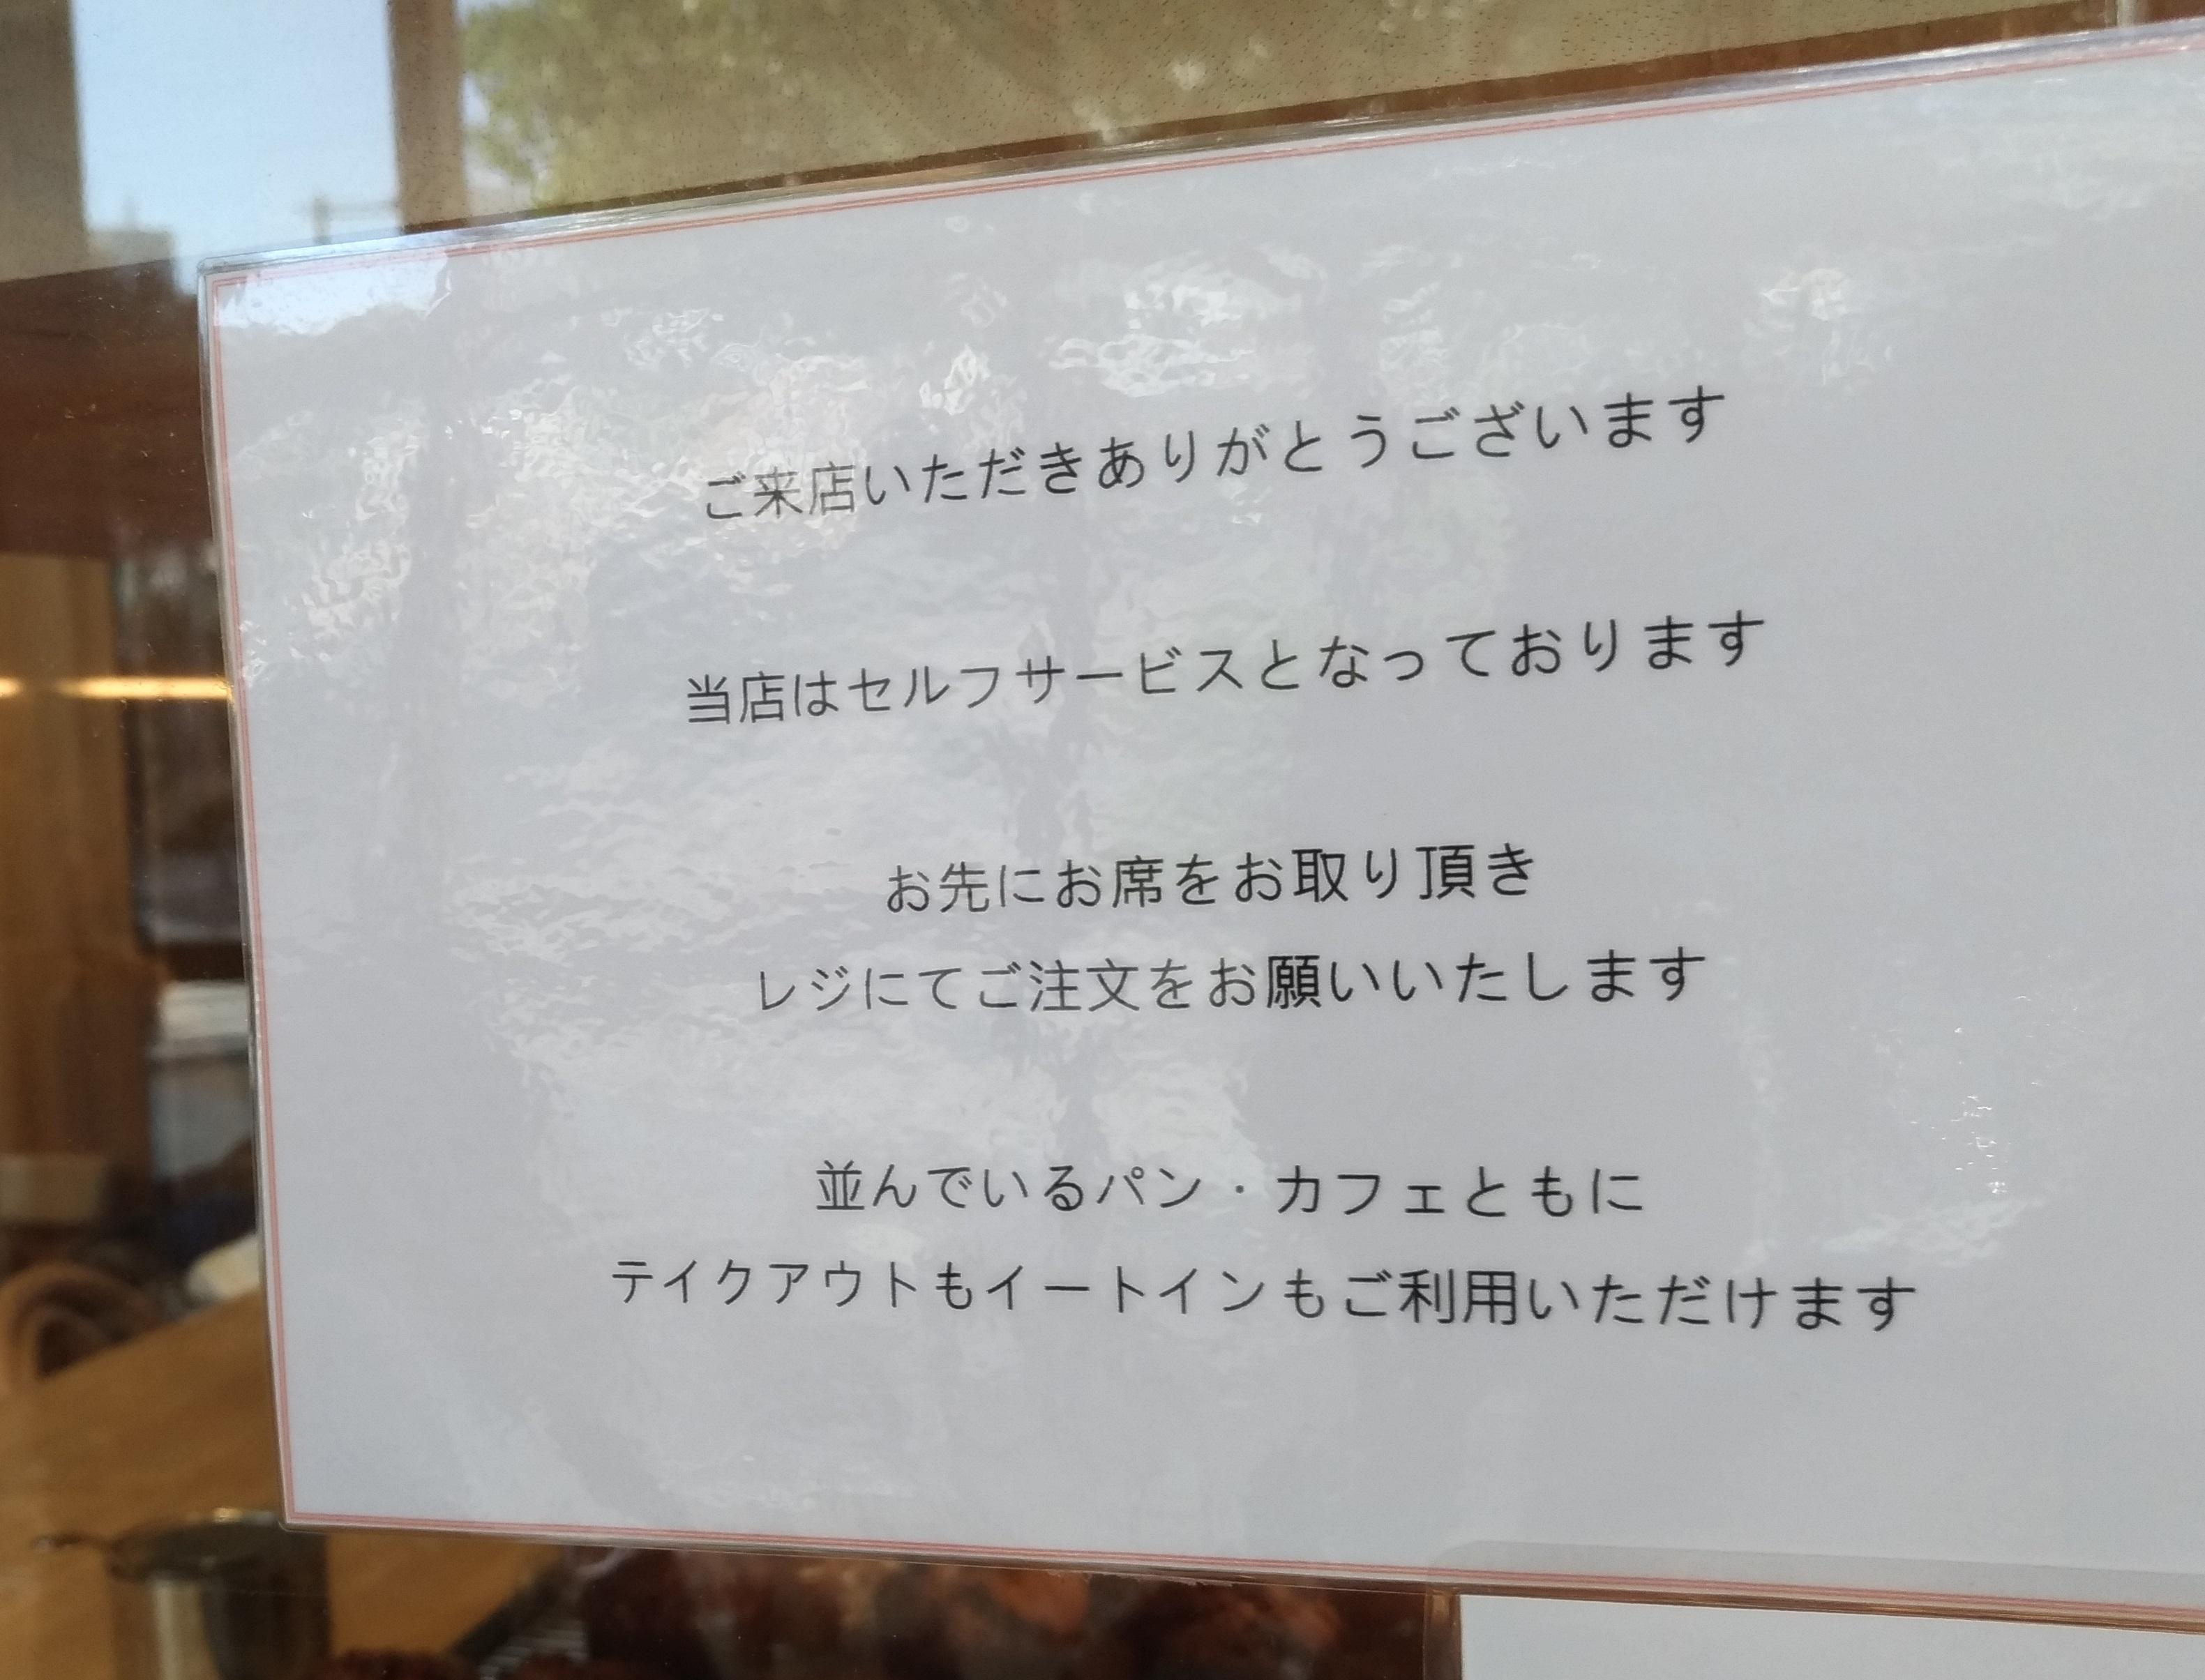 osaka_pan_minamimorimachi_bread_2.jpg